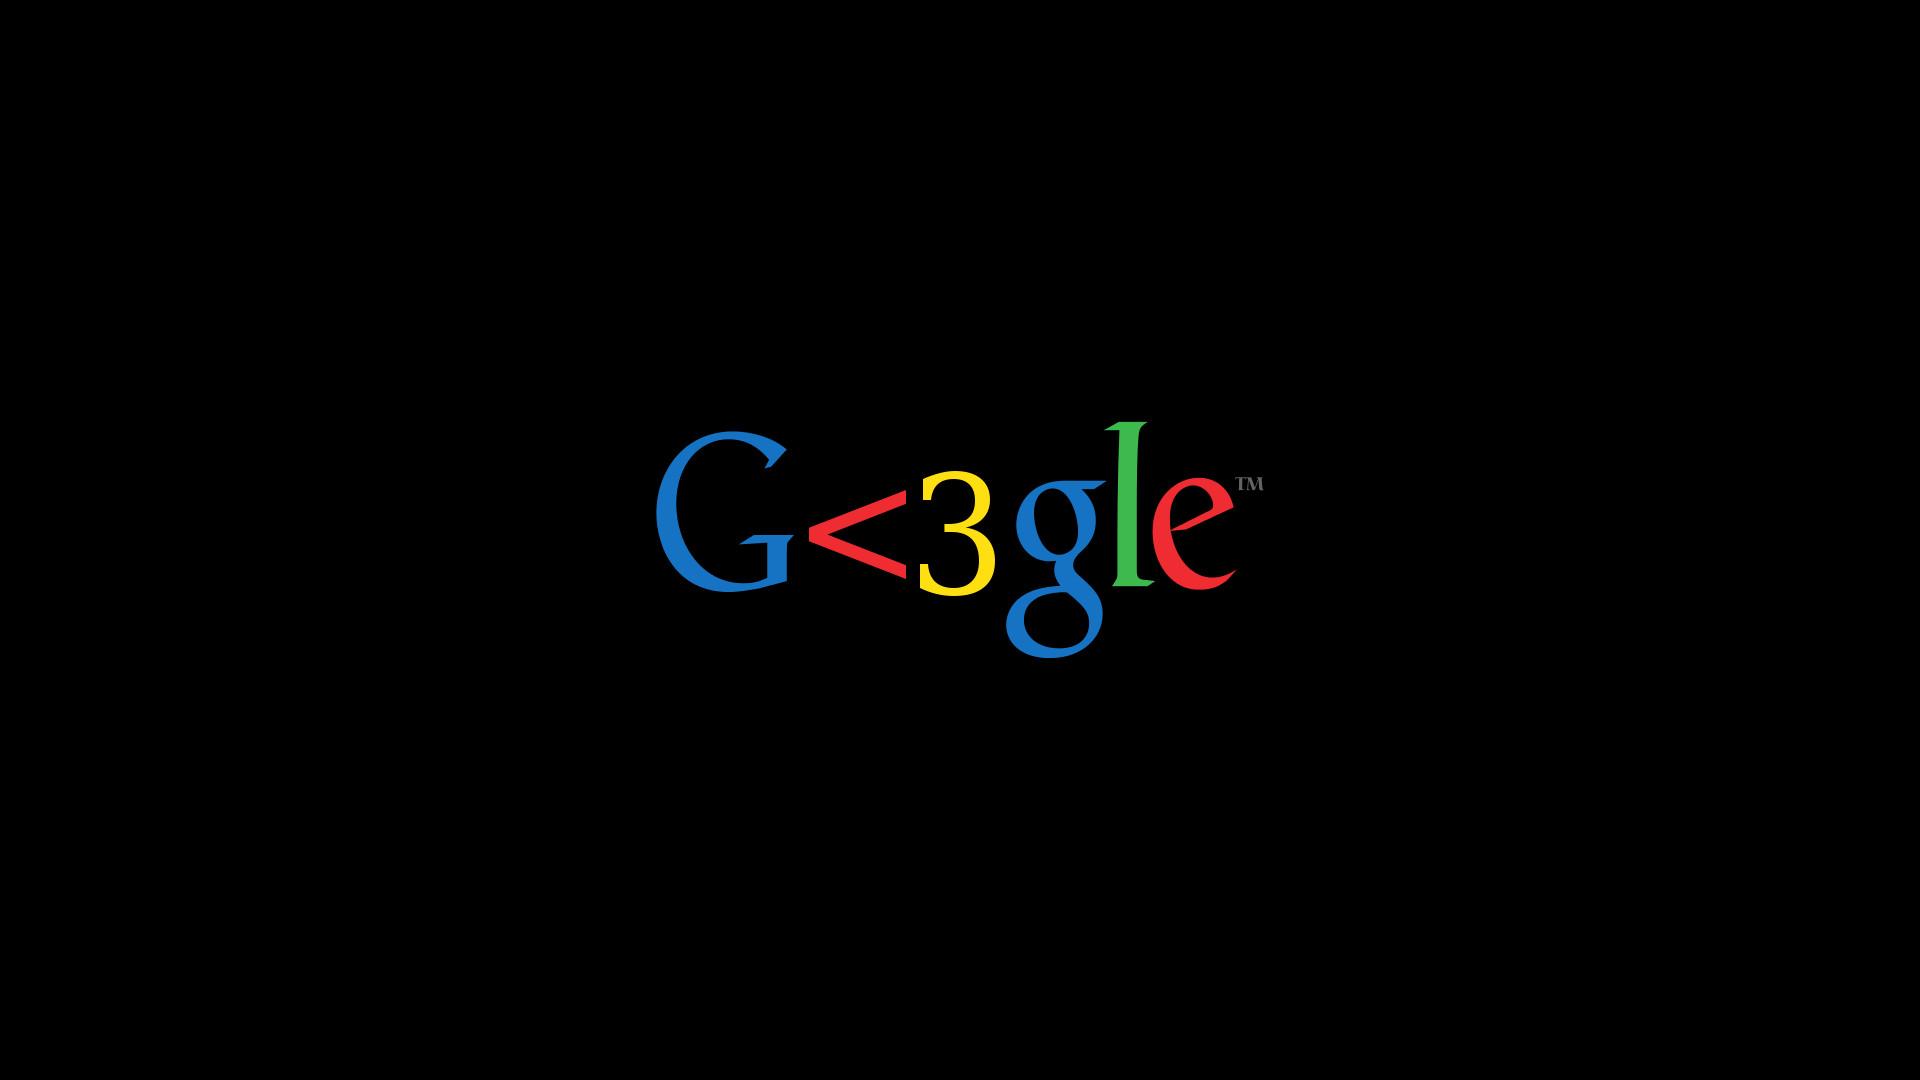 1920x1080 Google Love Wallpapers HD